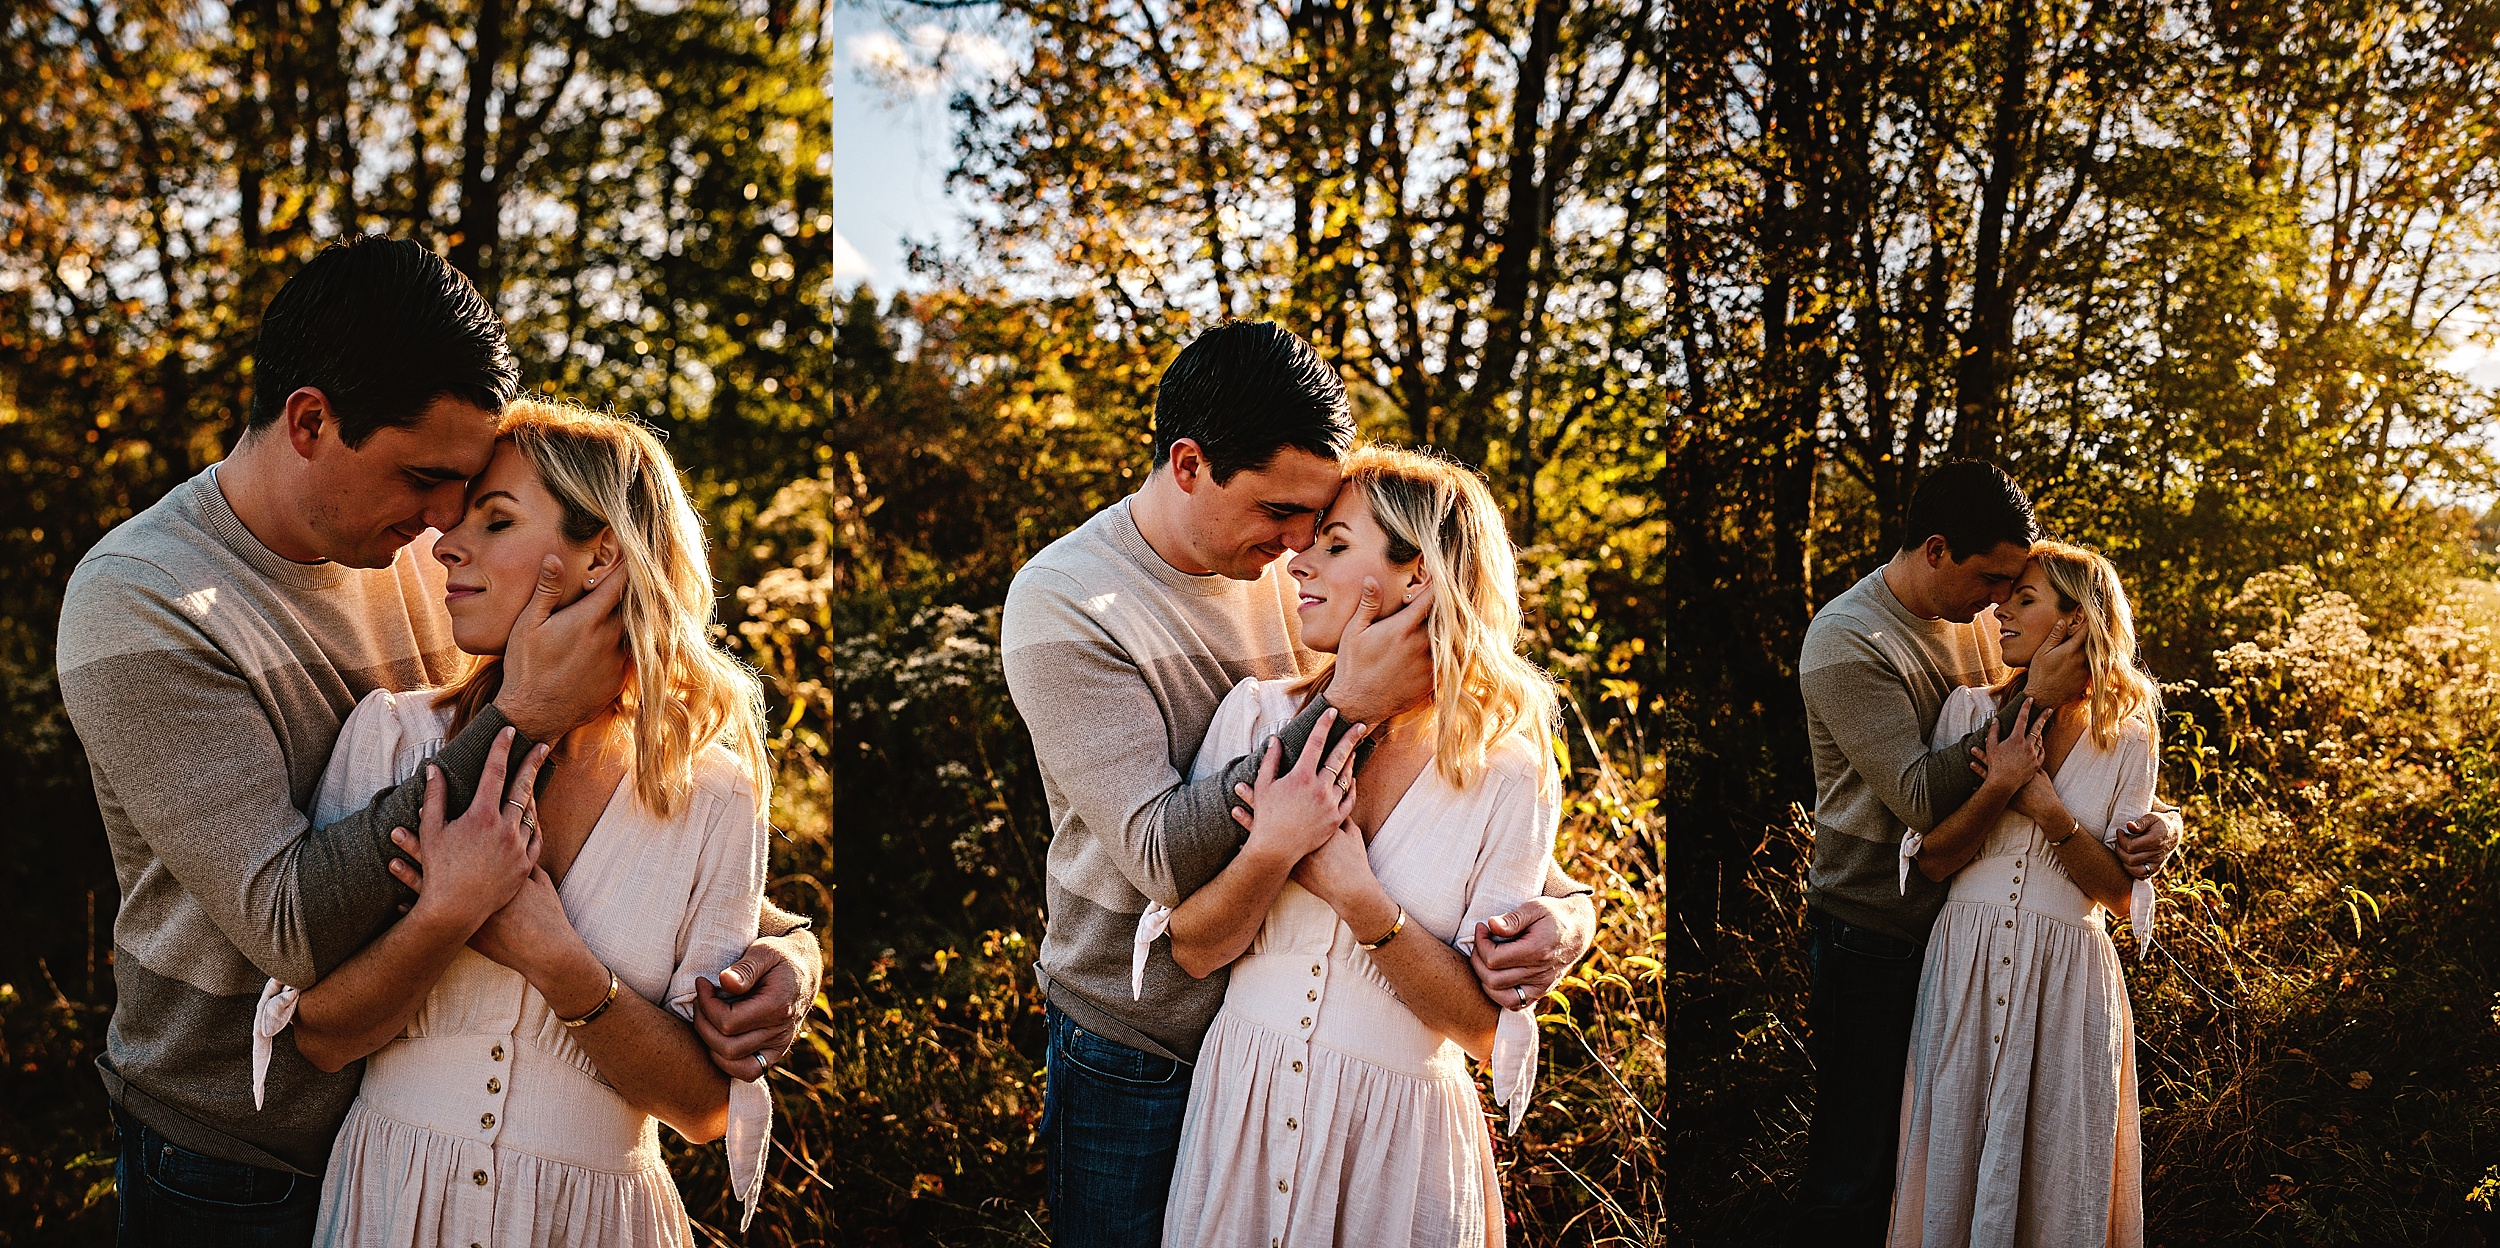 lauren-grayson-photography-portrait-artist-akron-cleveland-ohio-photographer-family-session-fields-sunset-fall_0183.jpg